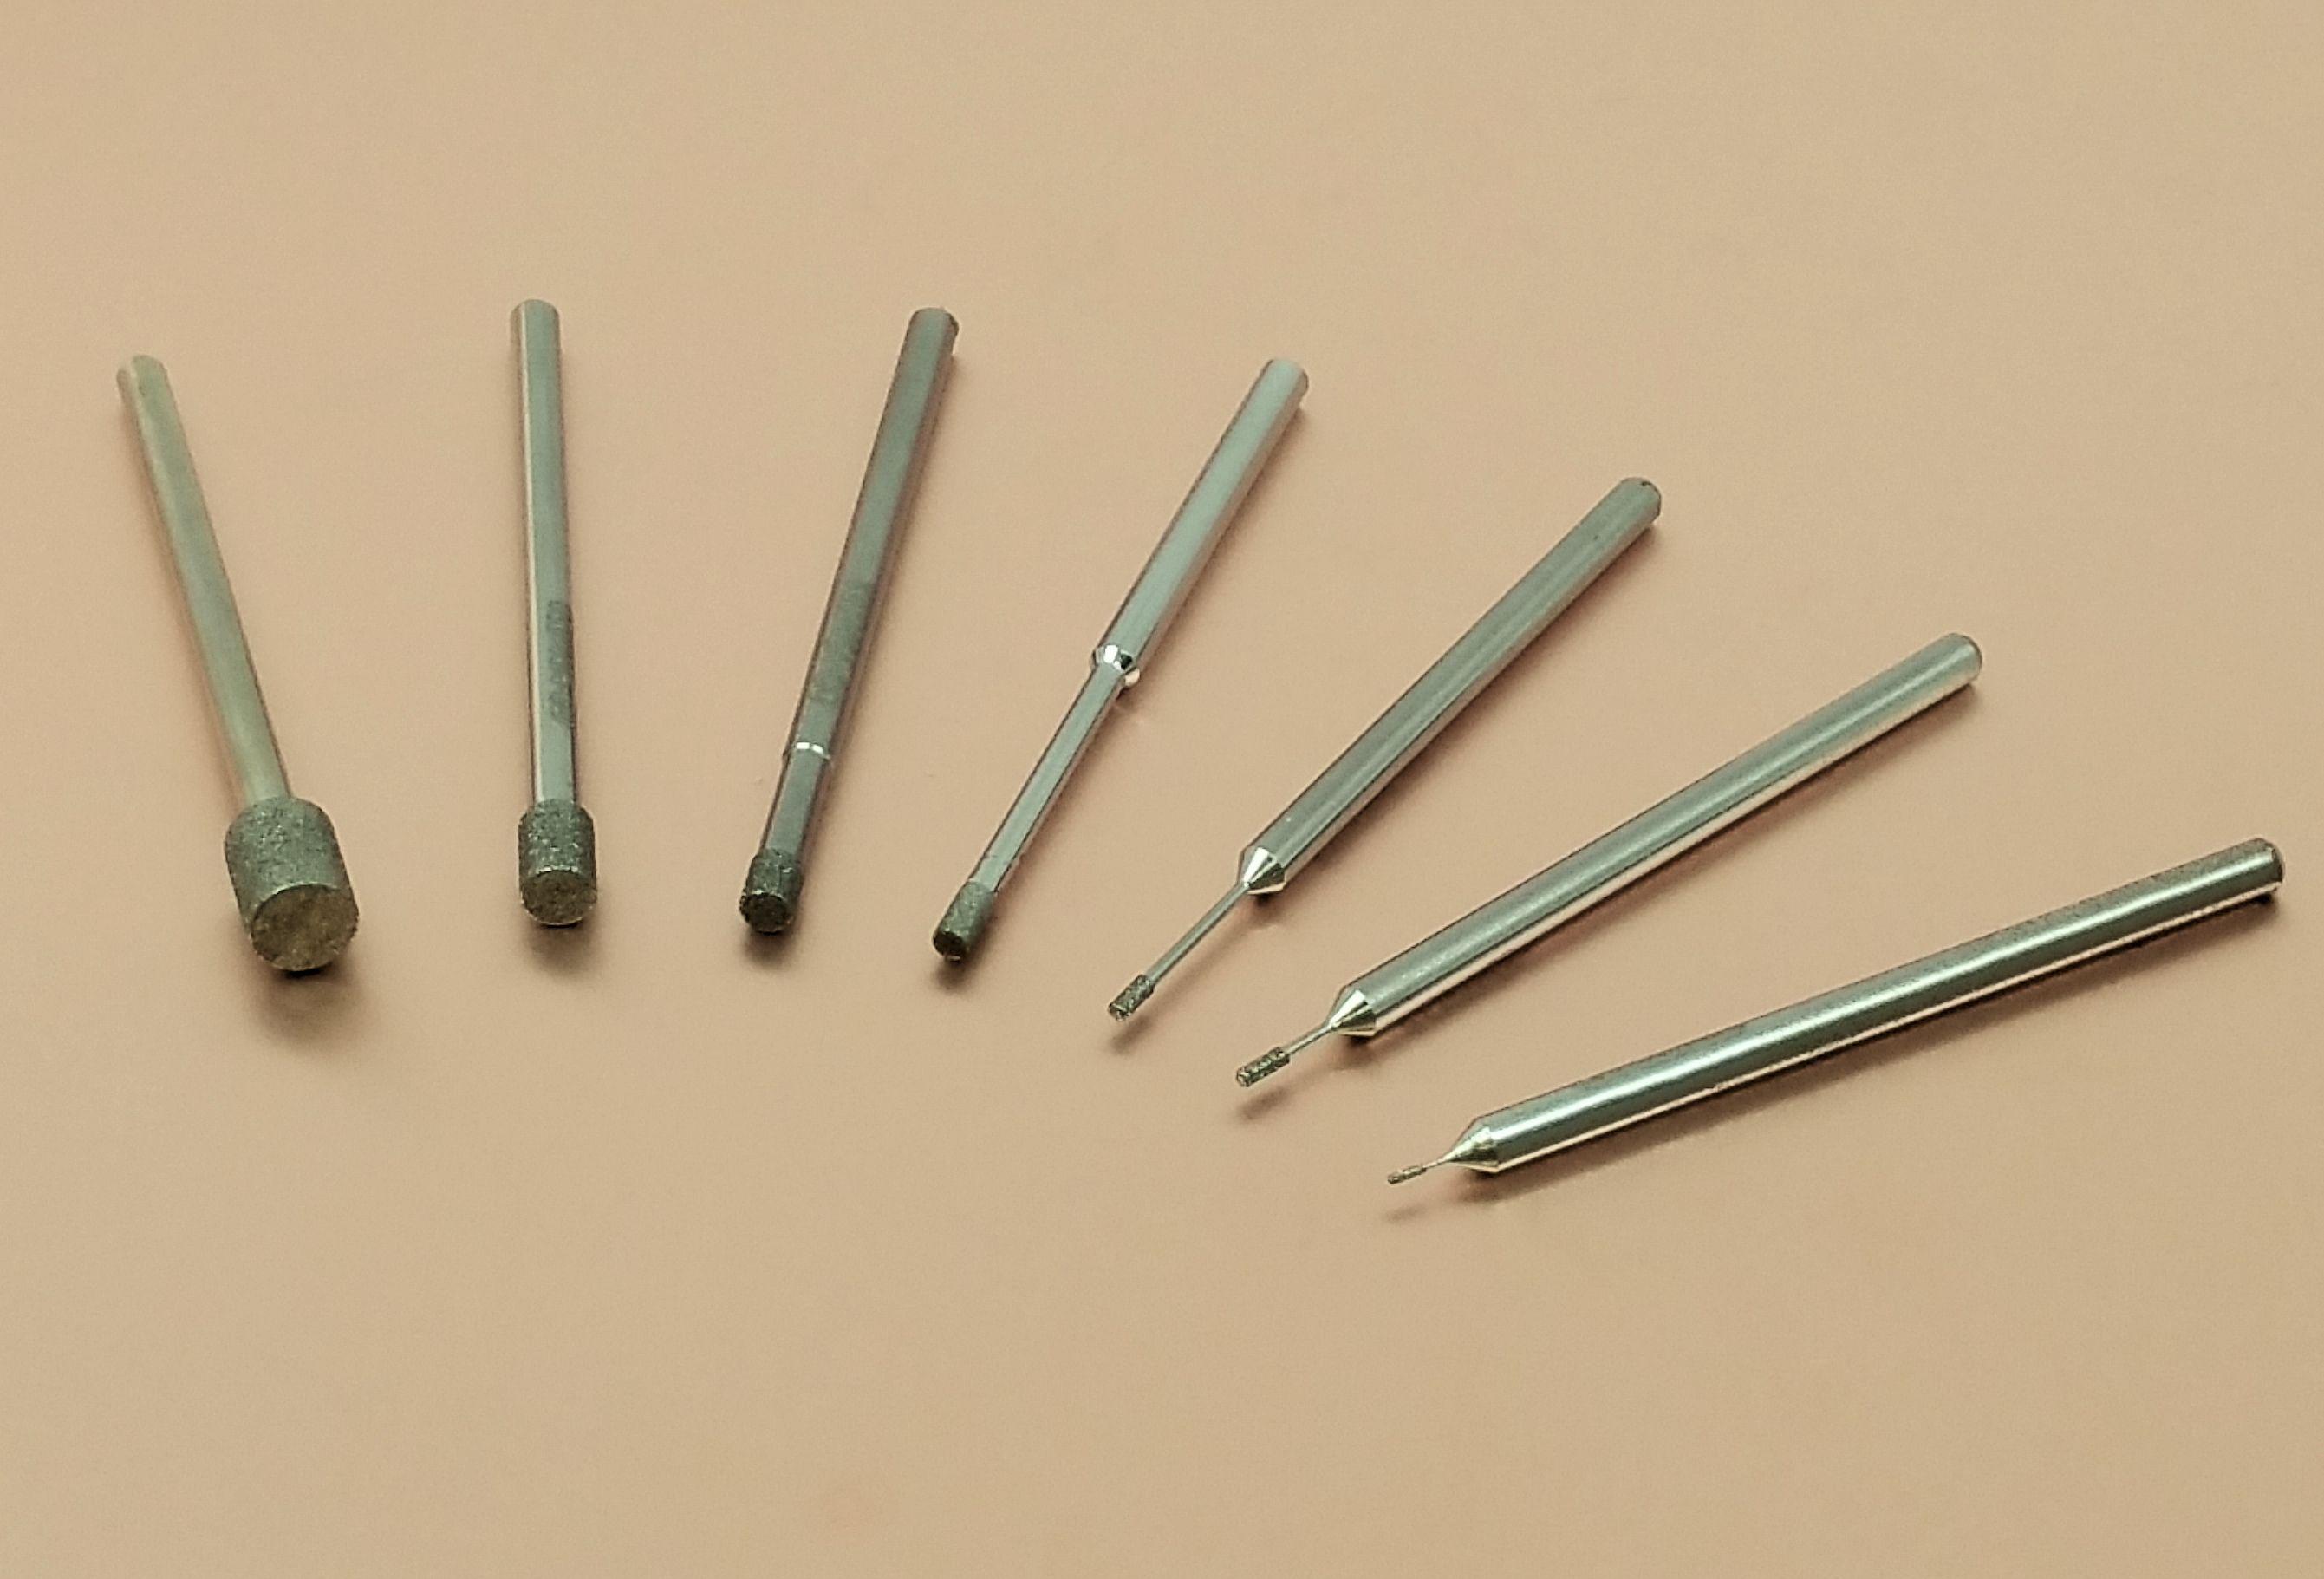 jig-grinding-mandrels-125-shank.jpg